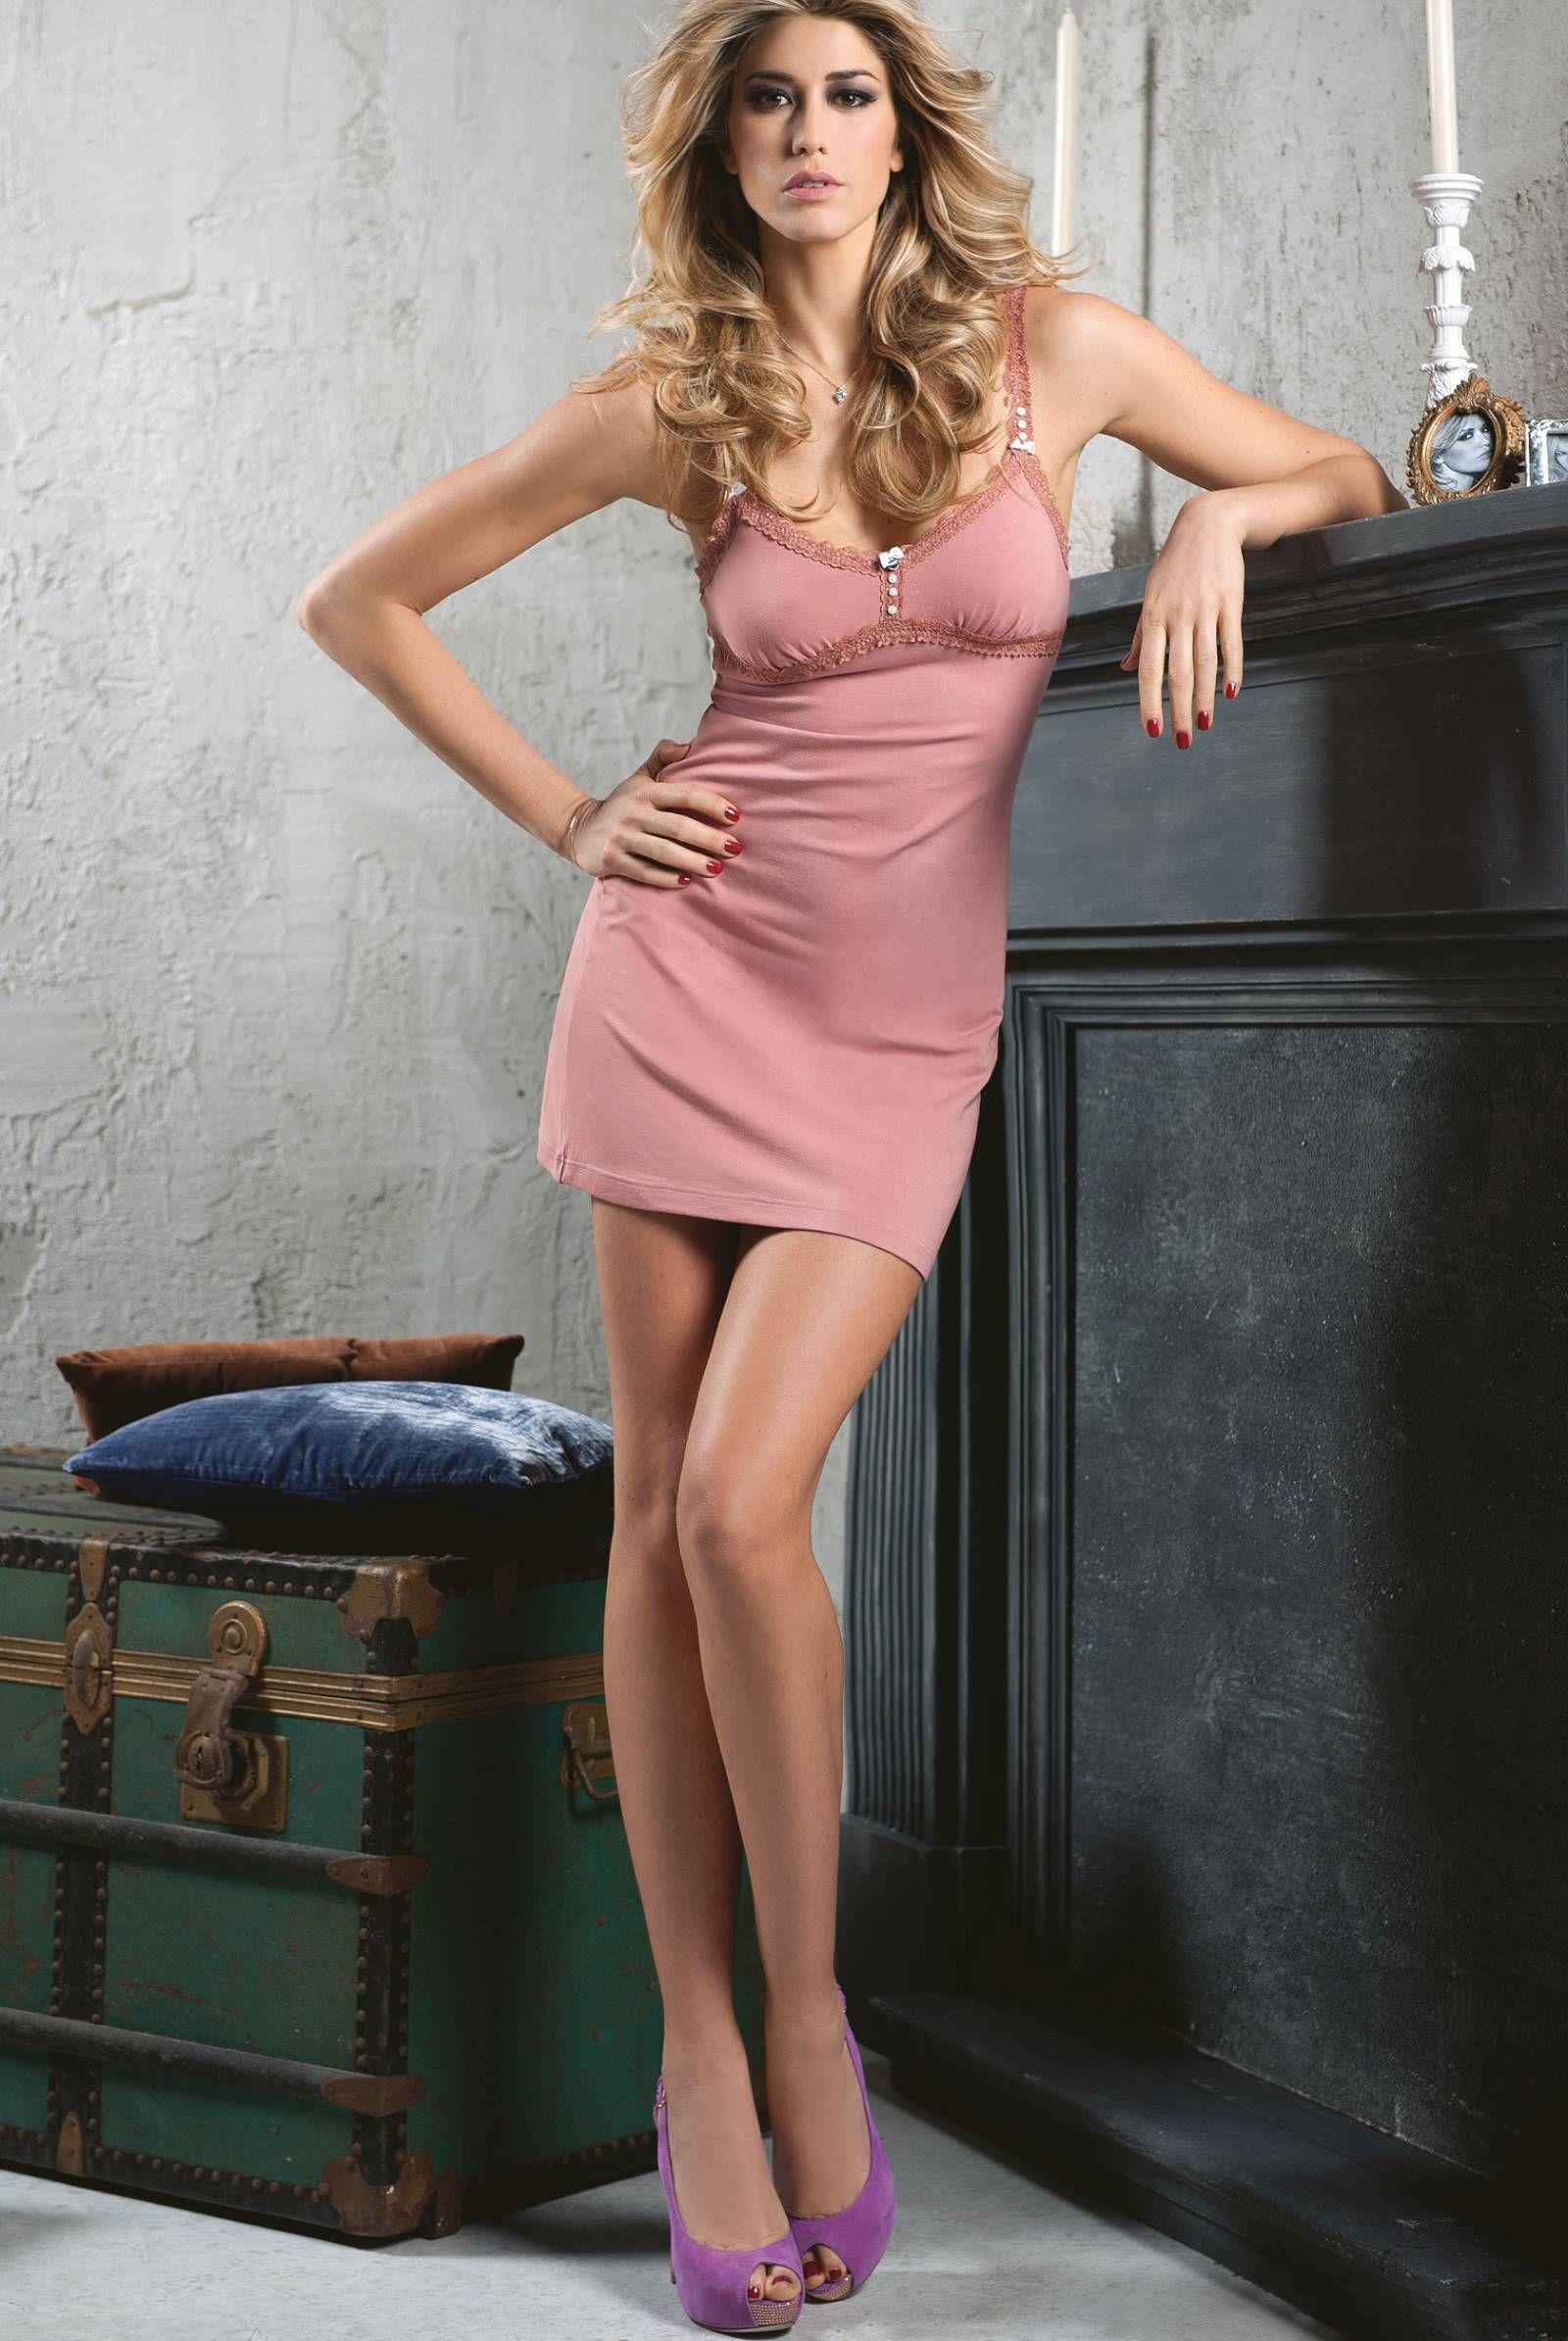 elena santarelli nude